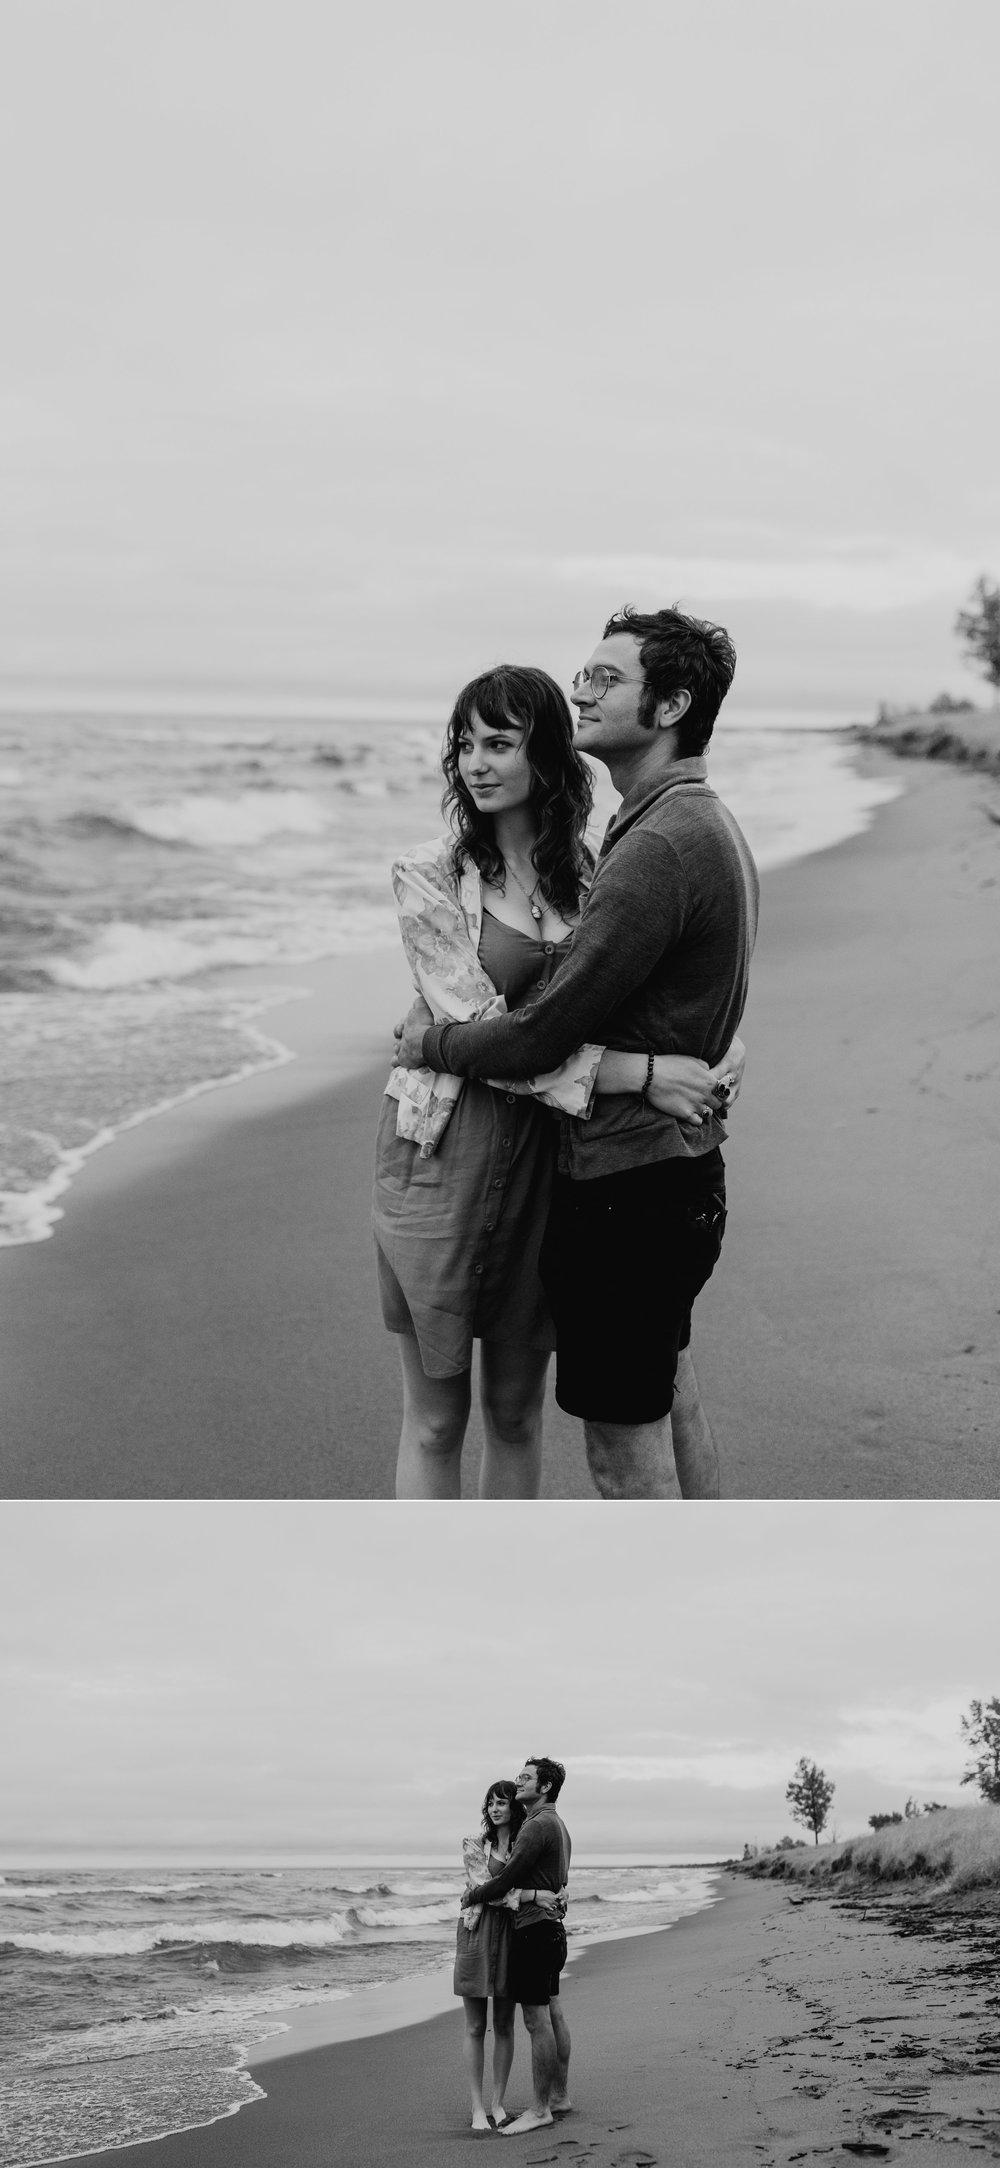 mandy aaron engagement minneapolis minnesota texas austin wedding elopement destination intimate best photographer_0156.jpg